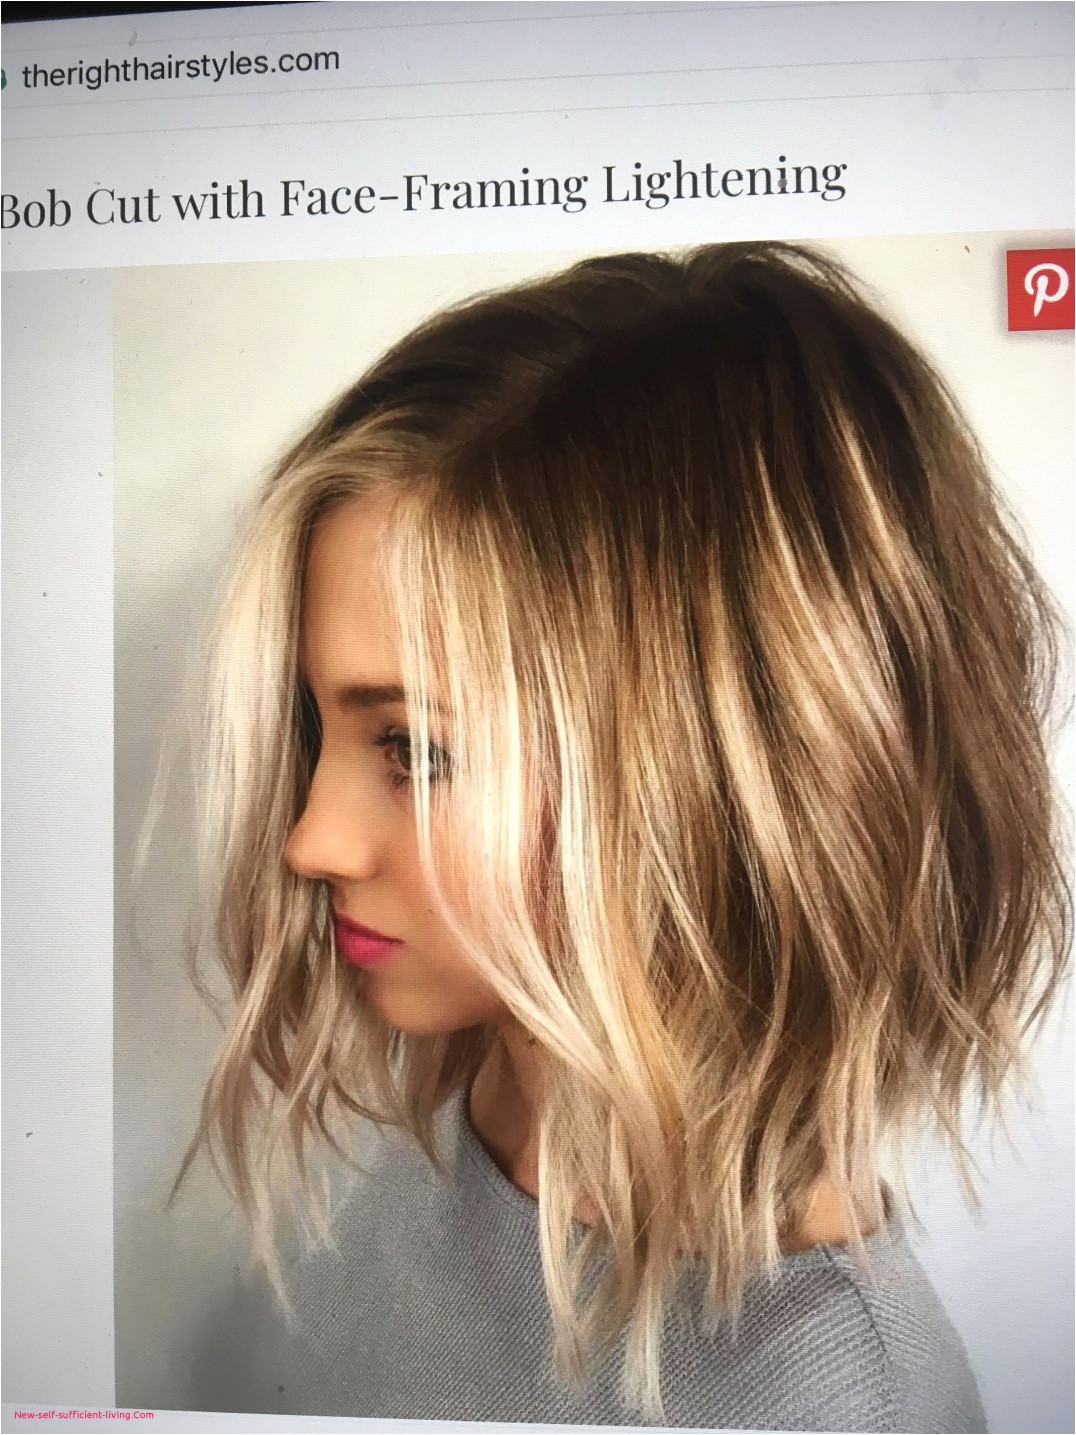 77 Medium Long Bob Hairstyles 2019